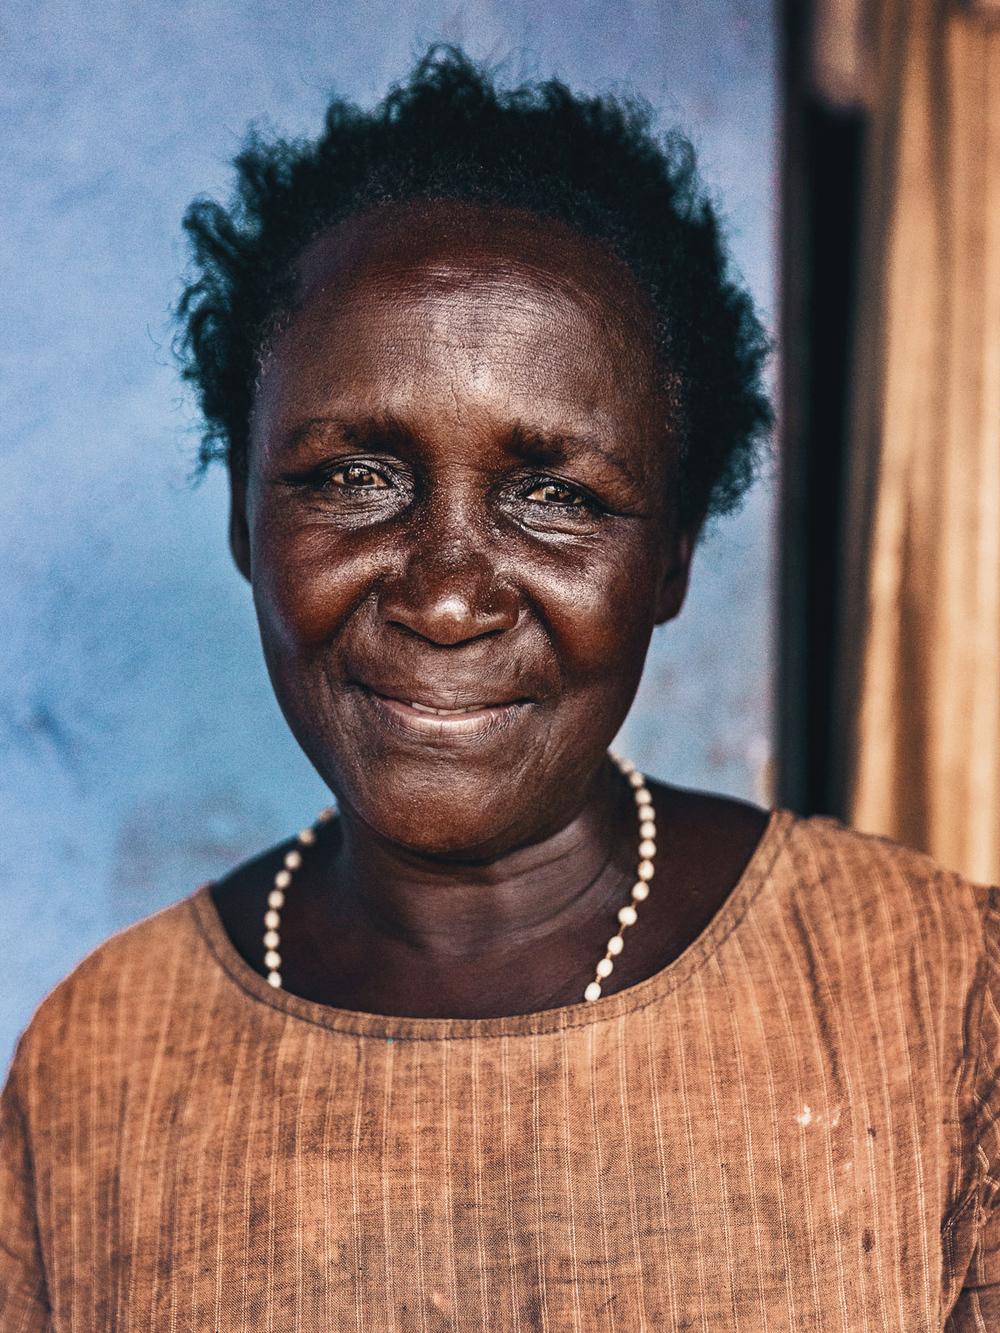 CallieGiovanna_Africa_Uganda_Jinja_20150101_09906.jpg